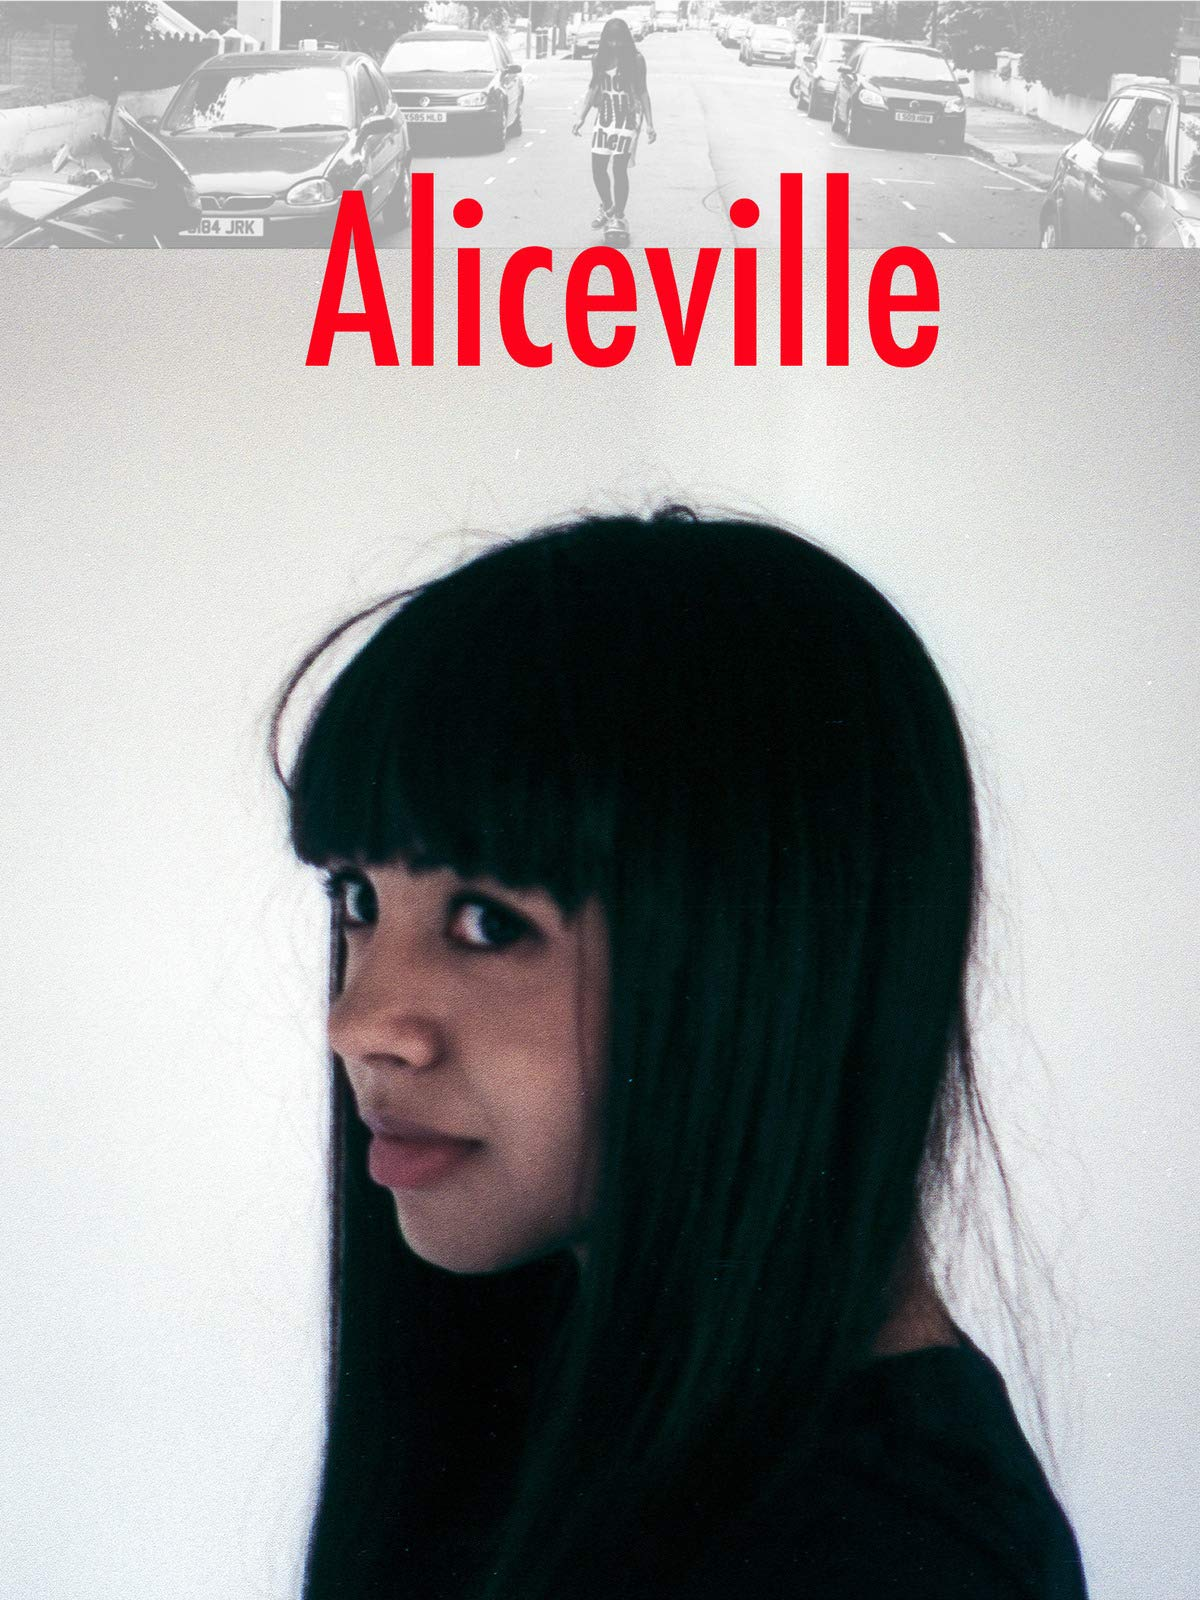 Aliceville